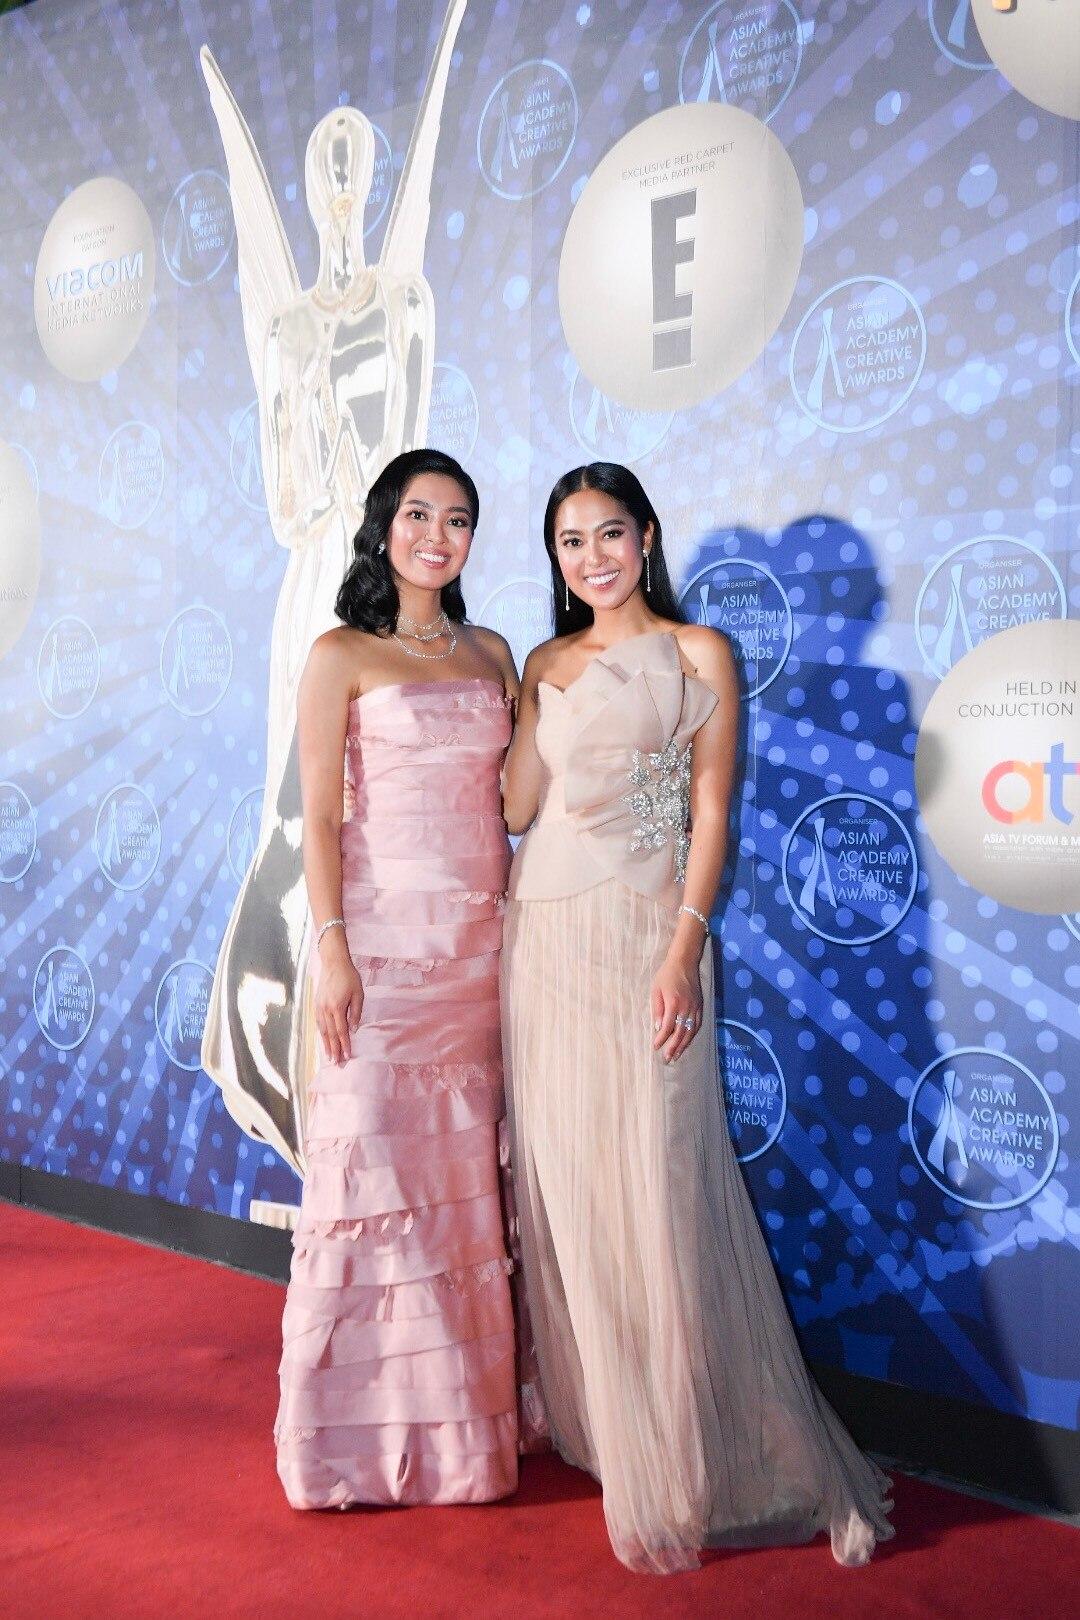 Elizabeth Rahajeng, Maria Rahajeng, 2018 AACAs Red Carpet